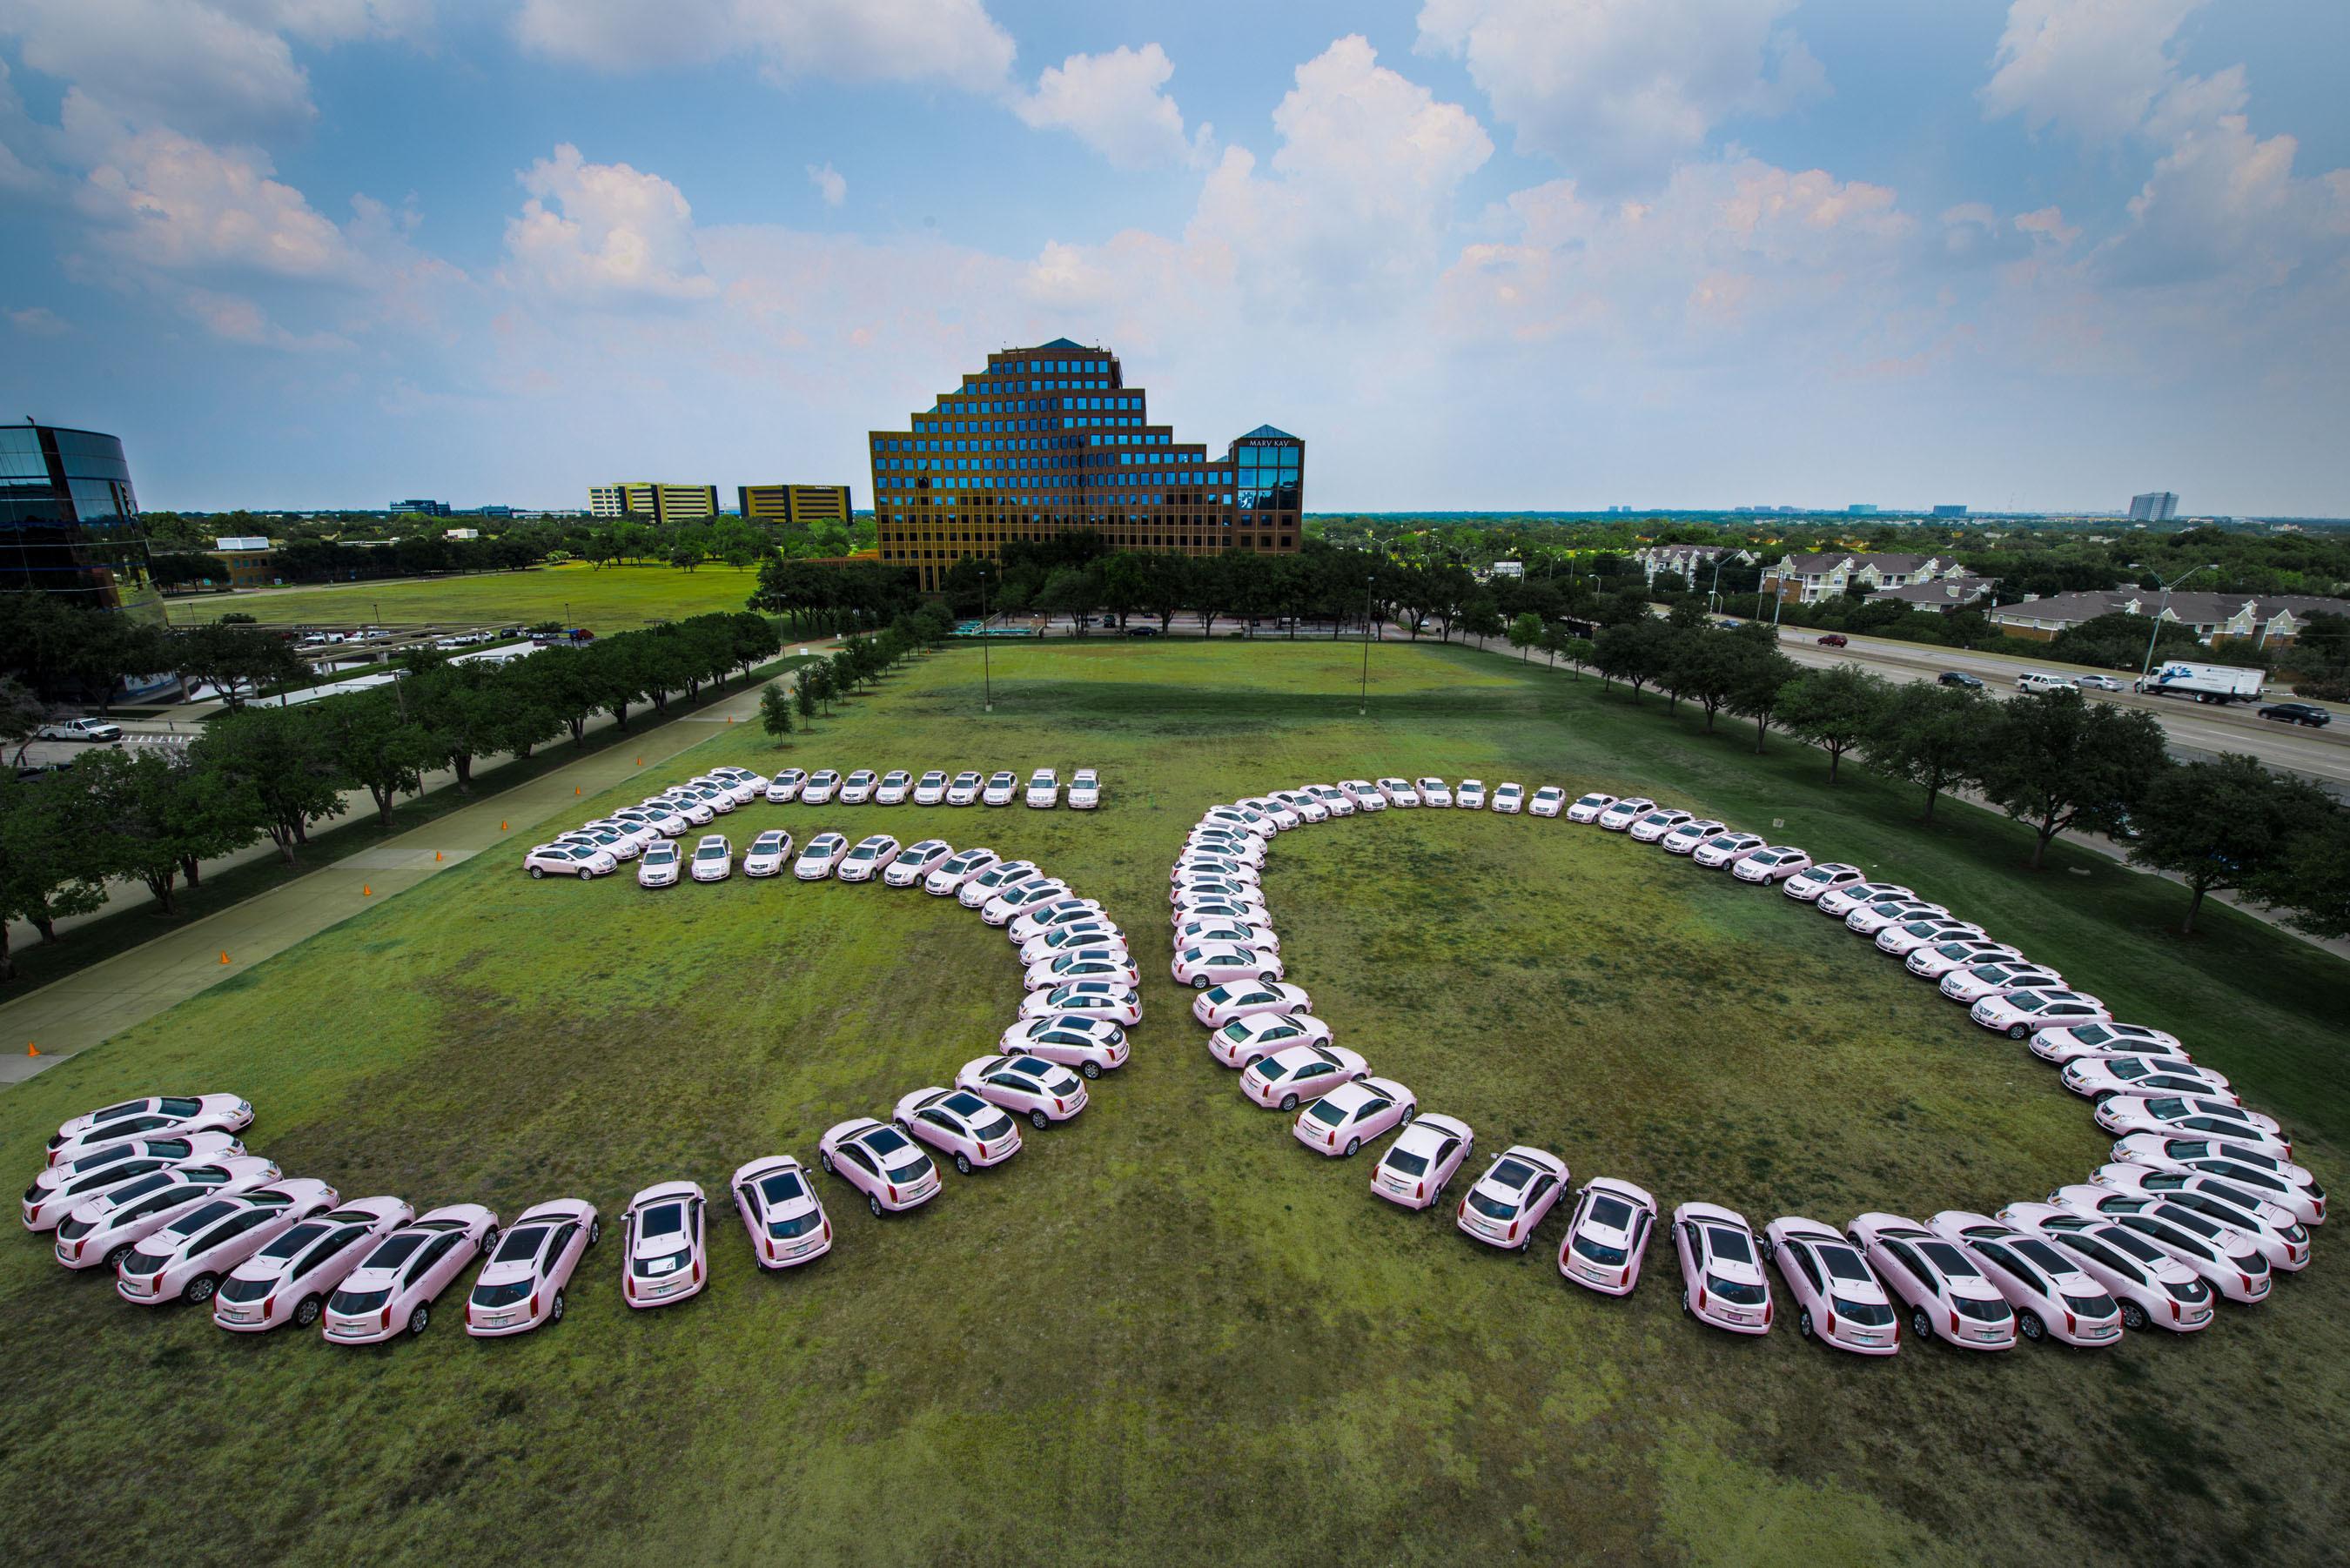 Mary Kay Inc.'s iconic pink Cadillacs salute the global beauty company's 50th anniversary. (PRNewsFoto/Mary Kay Inc.) (PRNewsFoto/MARY KAY INC.)